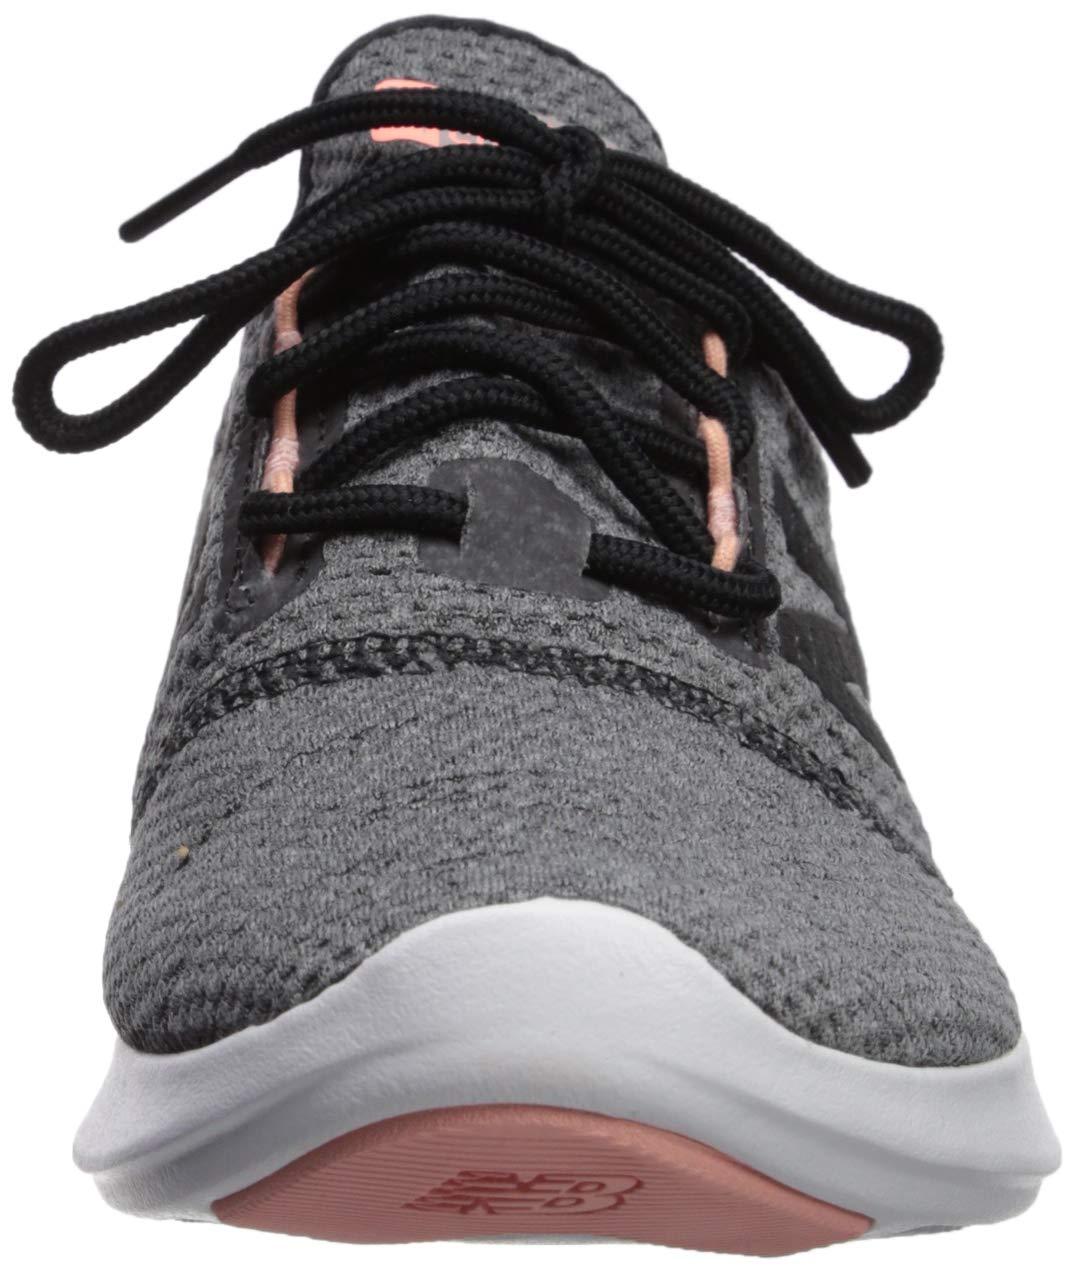 61ULbn5eoHL - New Balance Women's Fuel Core Coast V4 Running Shoes